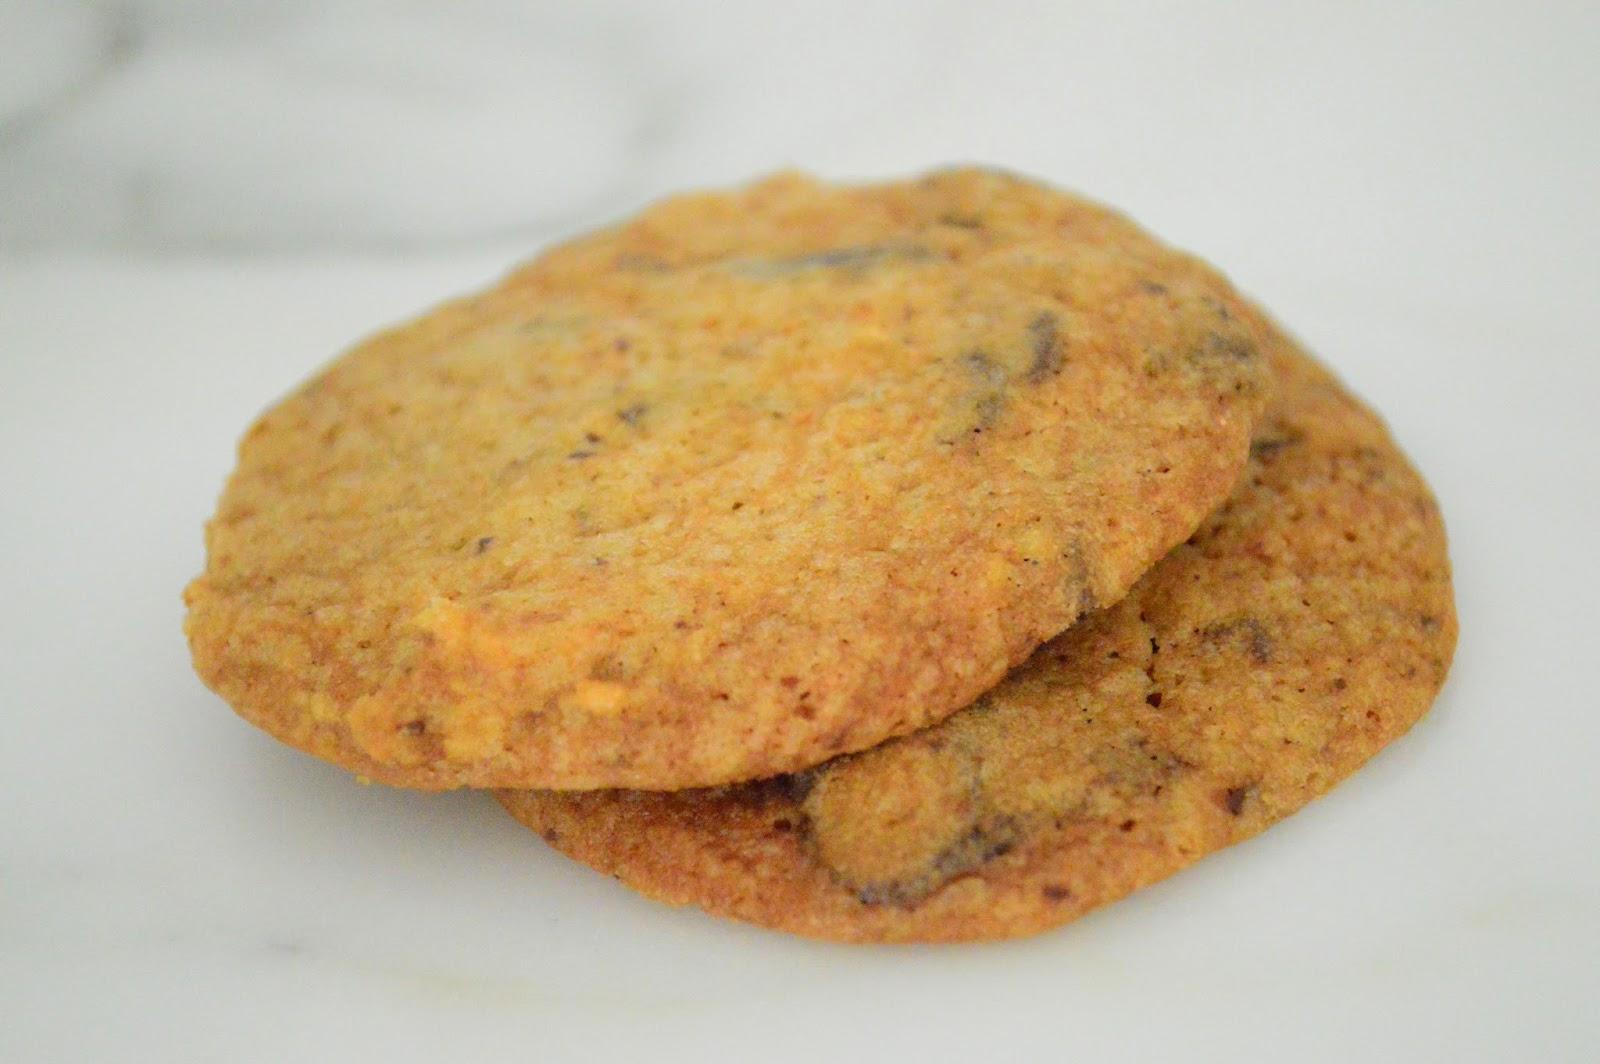 Lemon and Oregano: Martha Stewart's Thin and Crisp Chocolate Chip ...